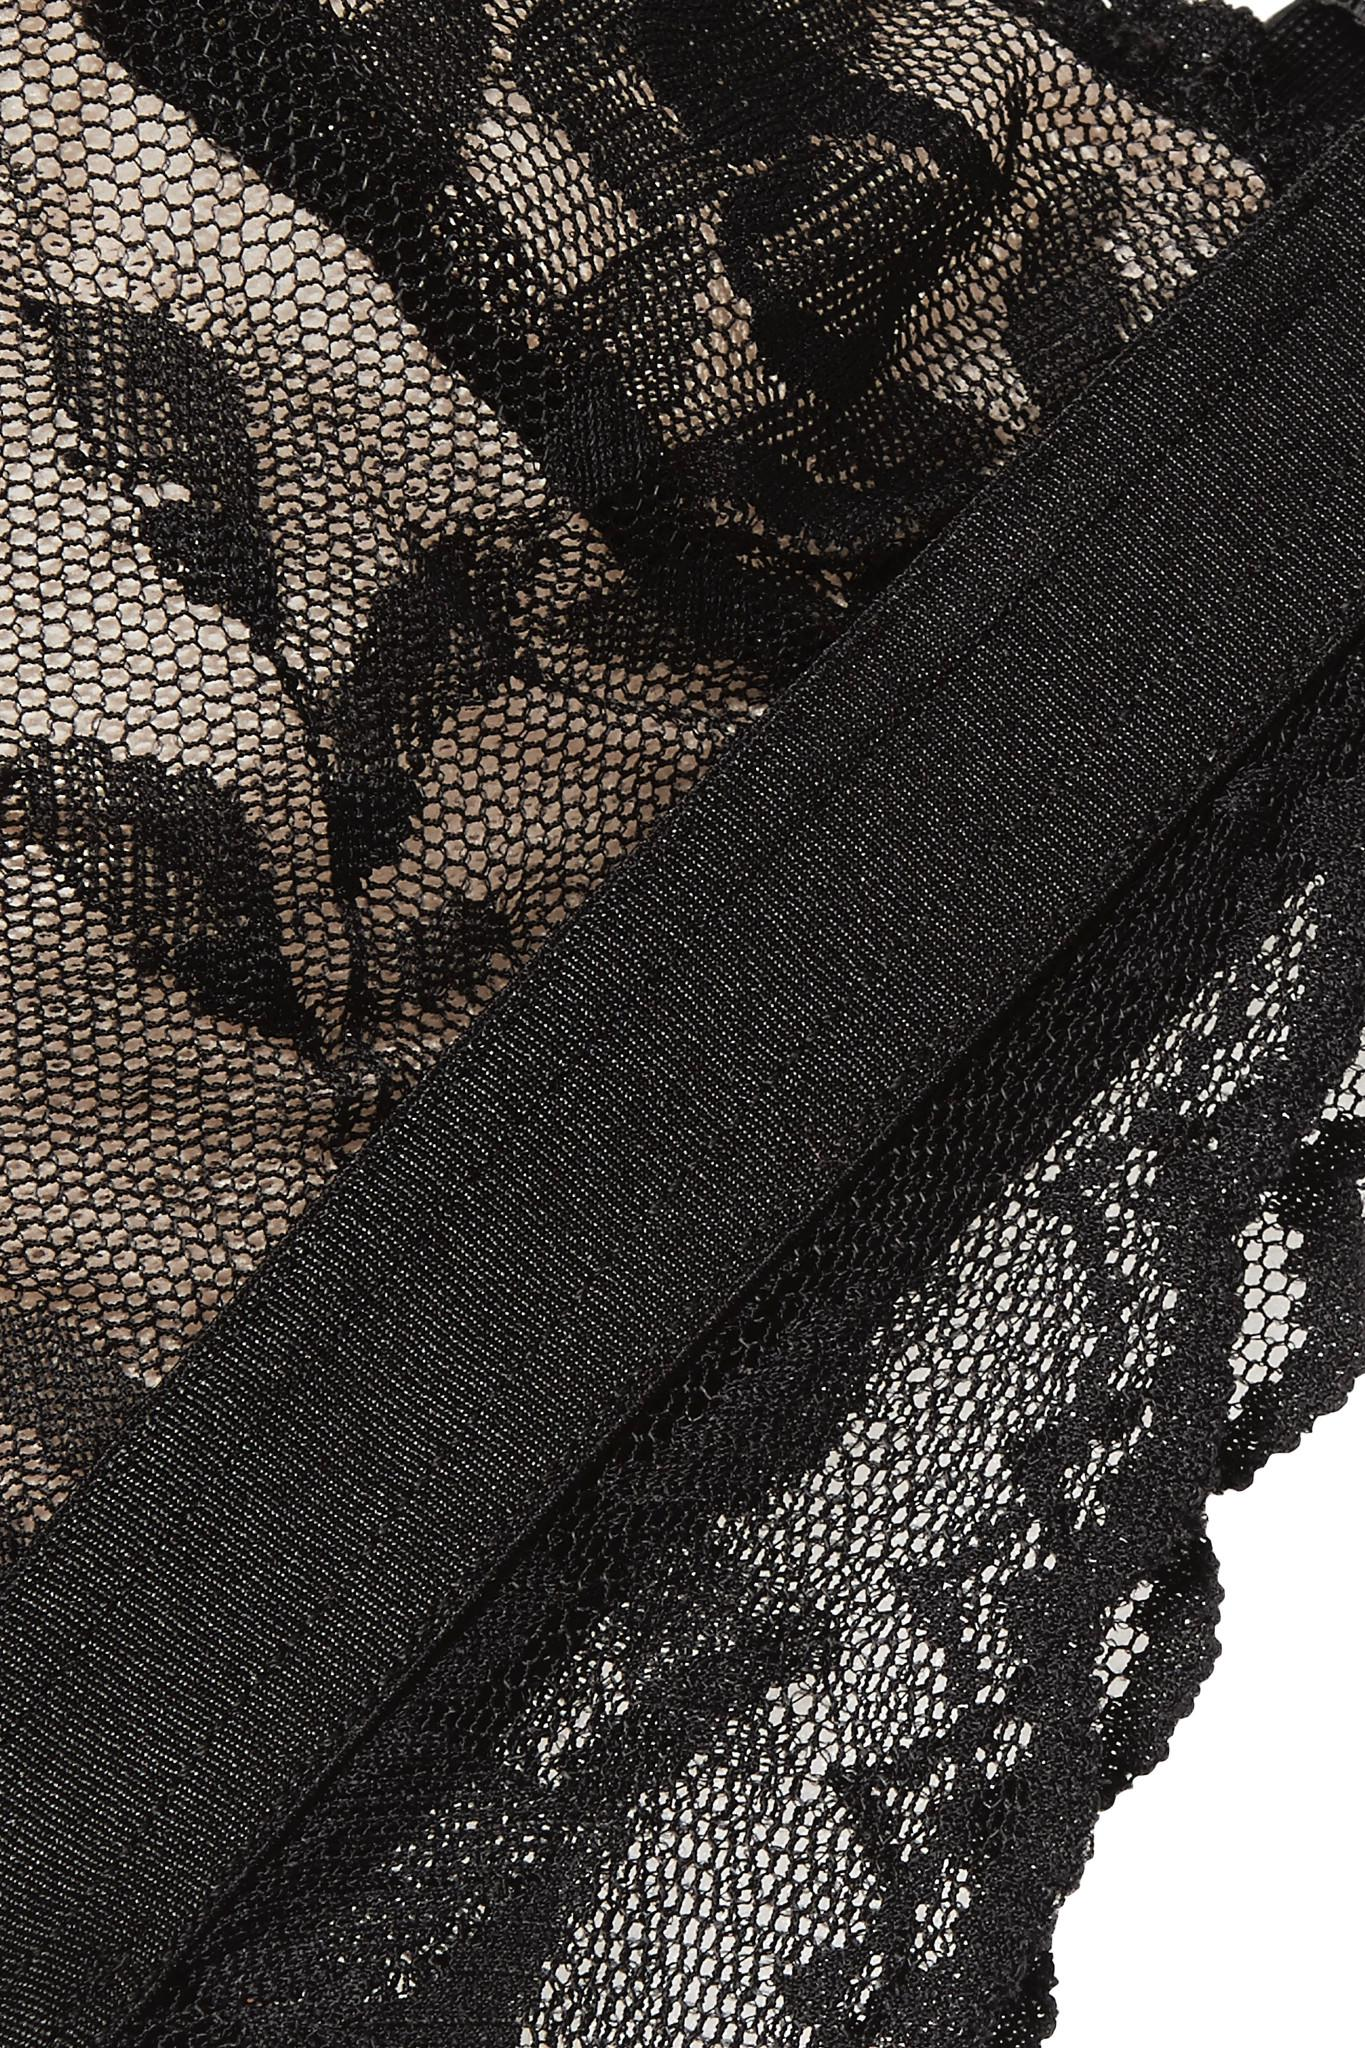 Seymour Stretch-lace Soft-cup Bra - Black Cosabella Cheap Sale Get To Buy Original Cheap Online f5qZhb